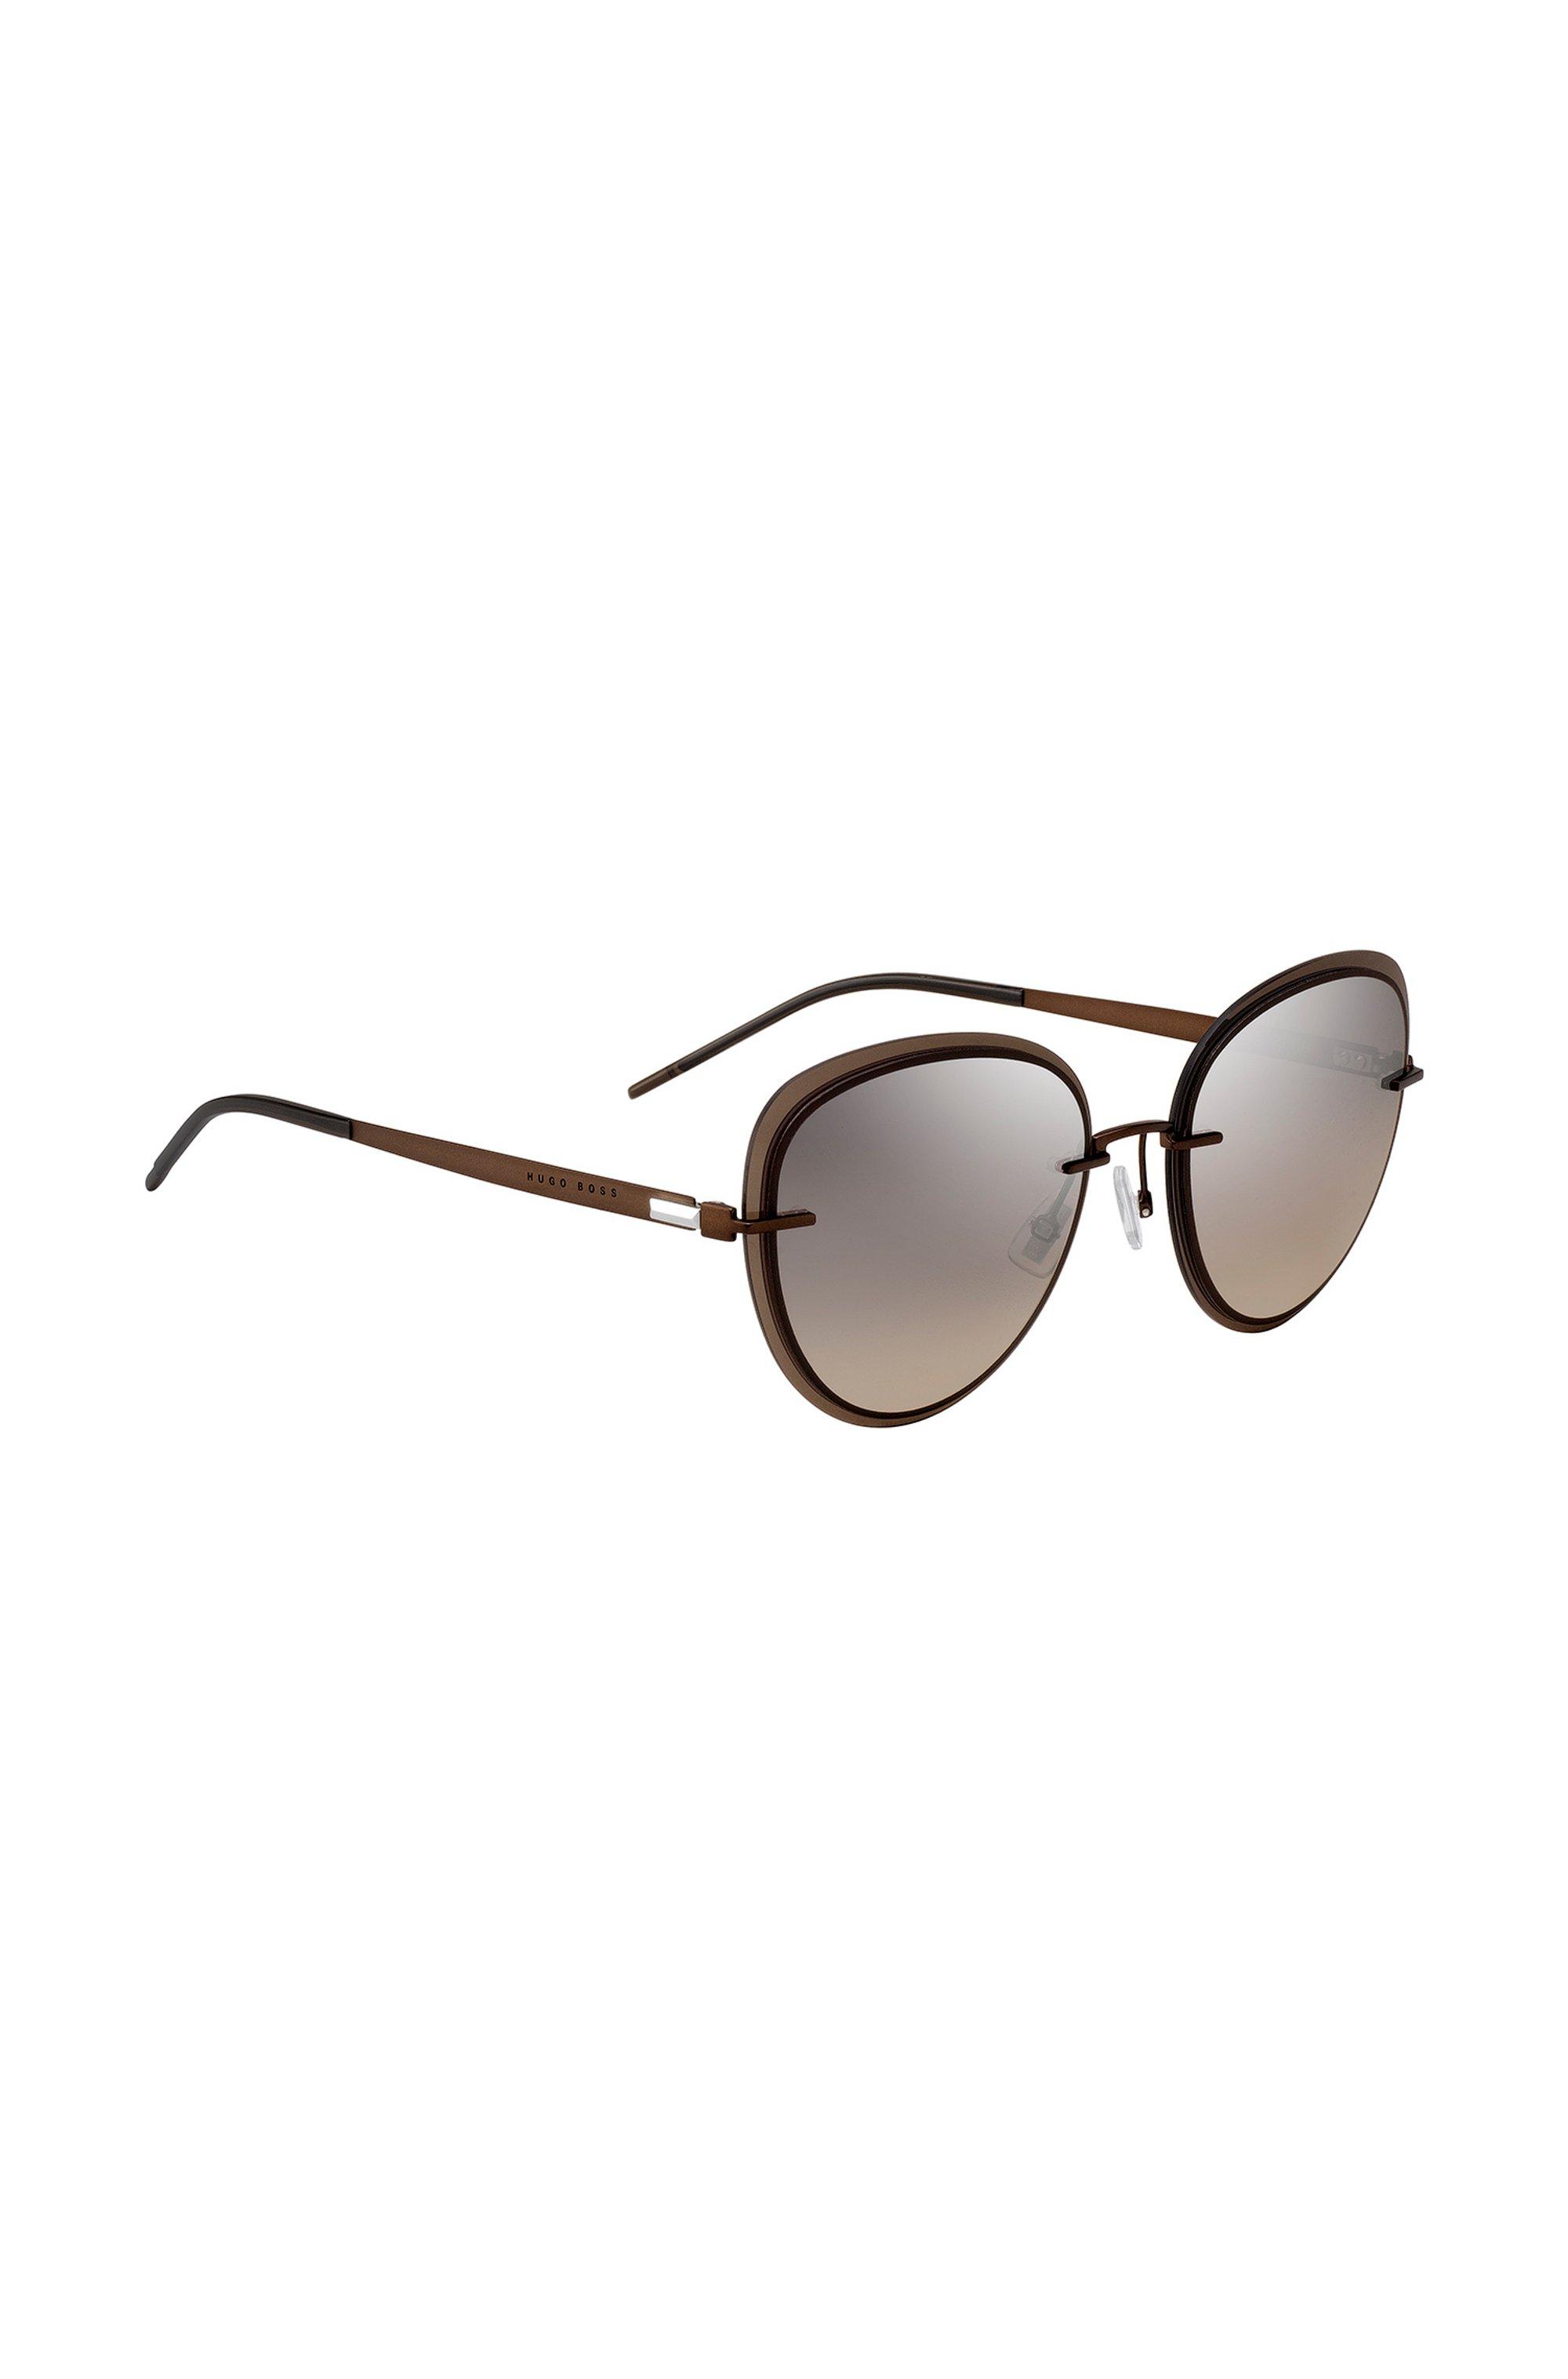 Braune Sonnenbrille mit transparenten Kanten, Dunkelbraun